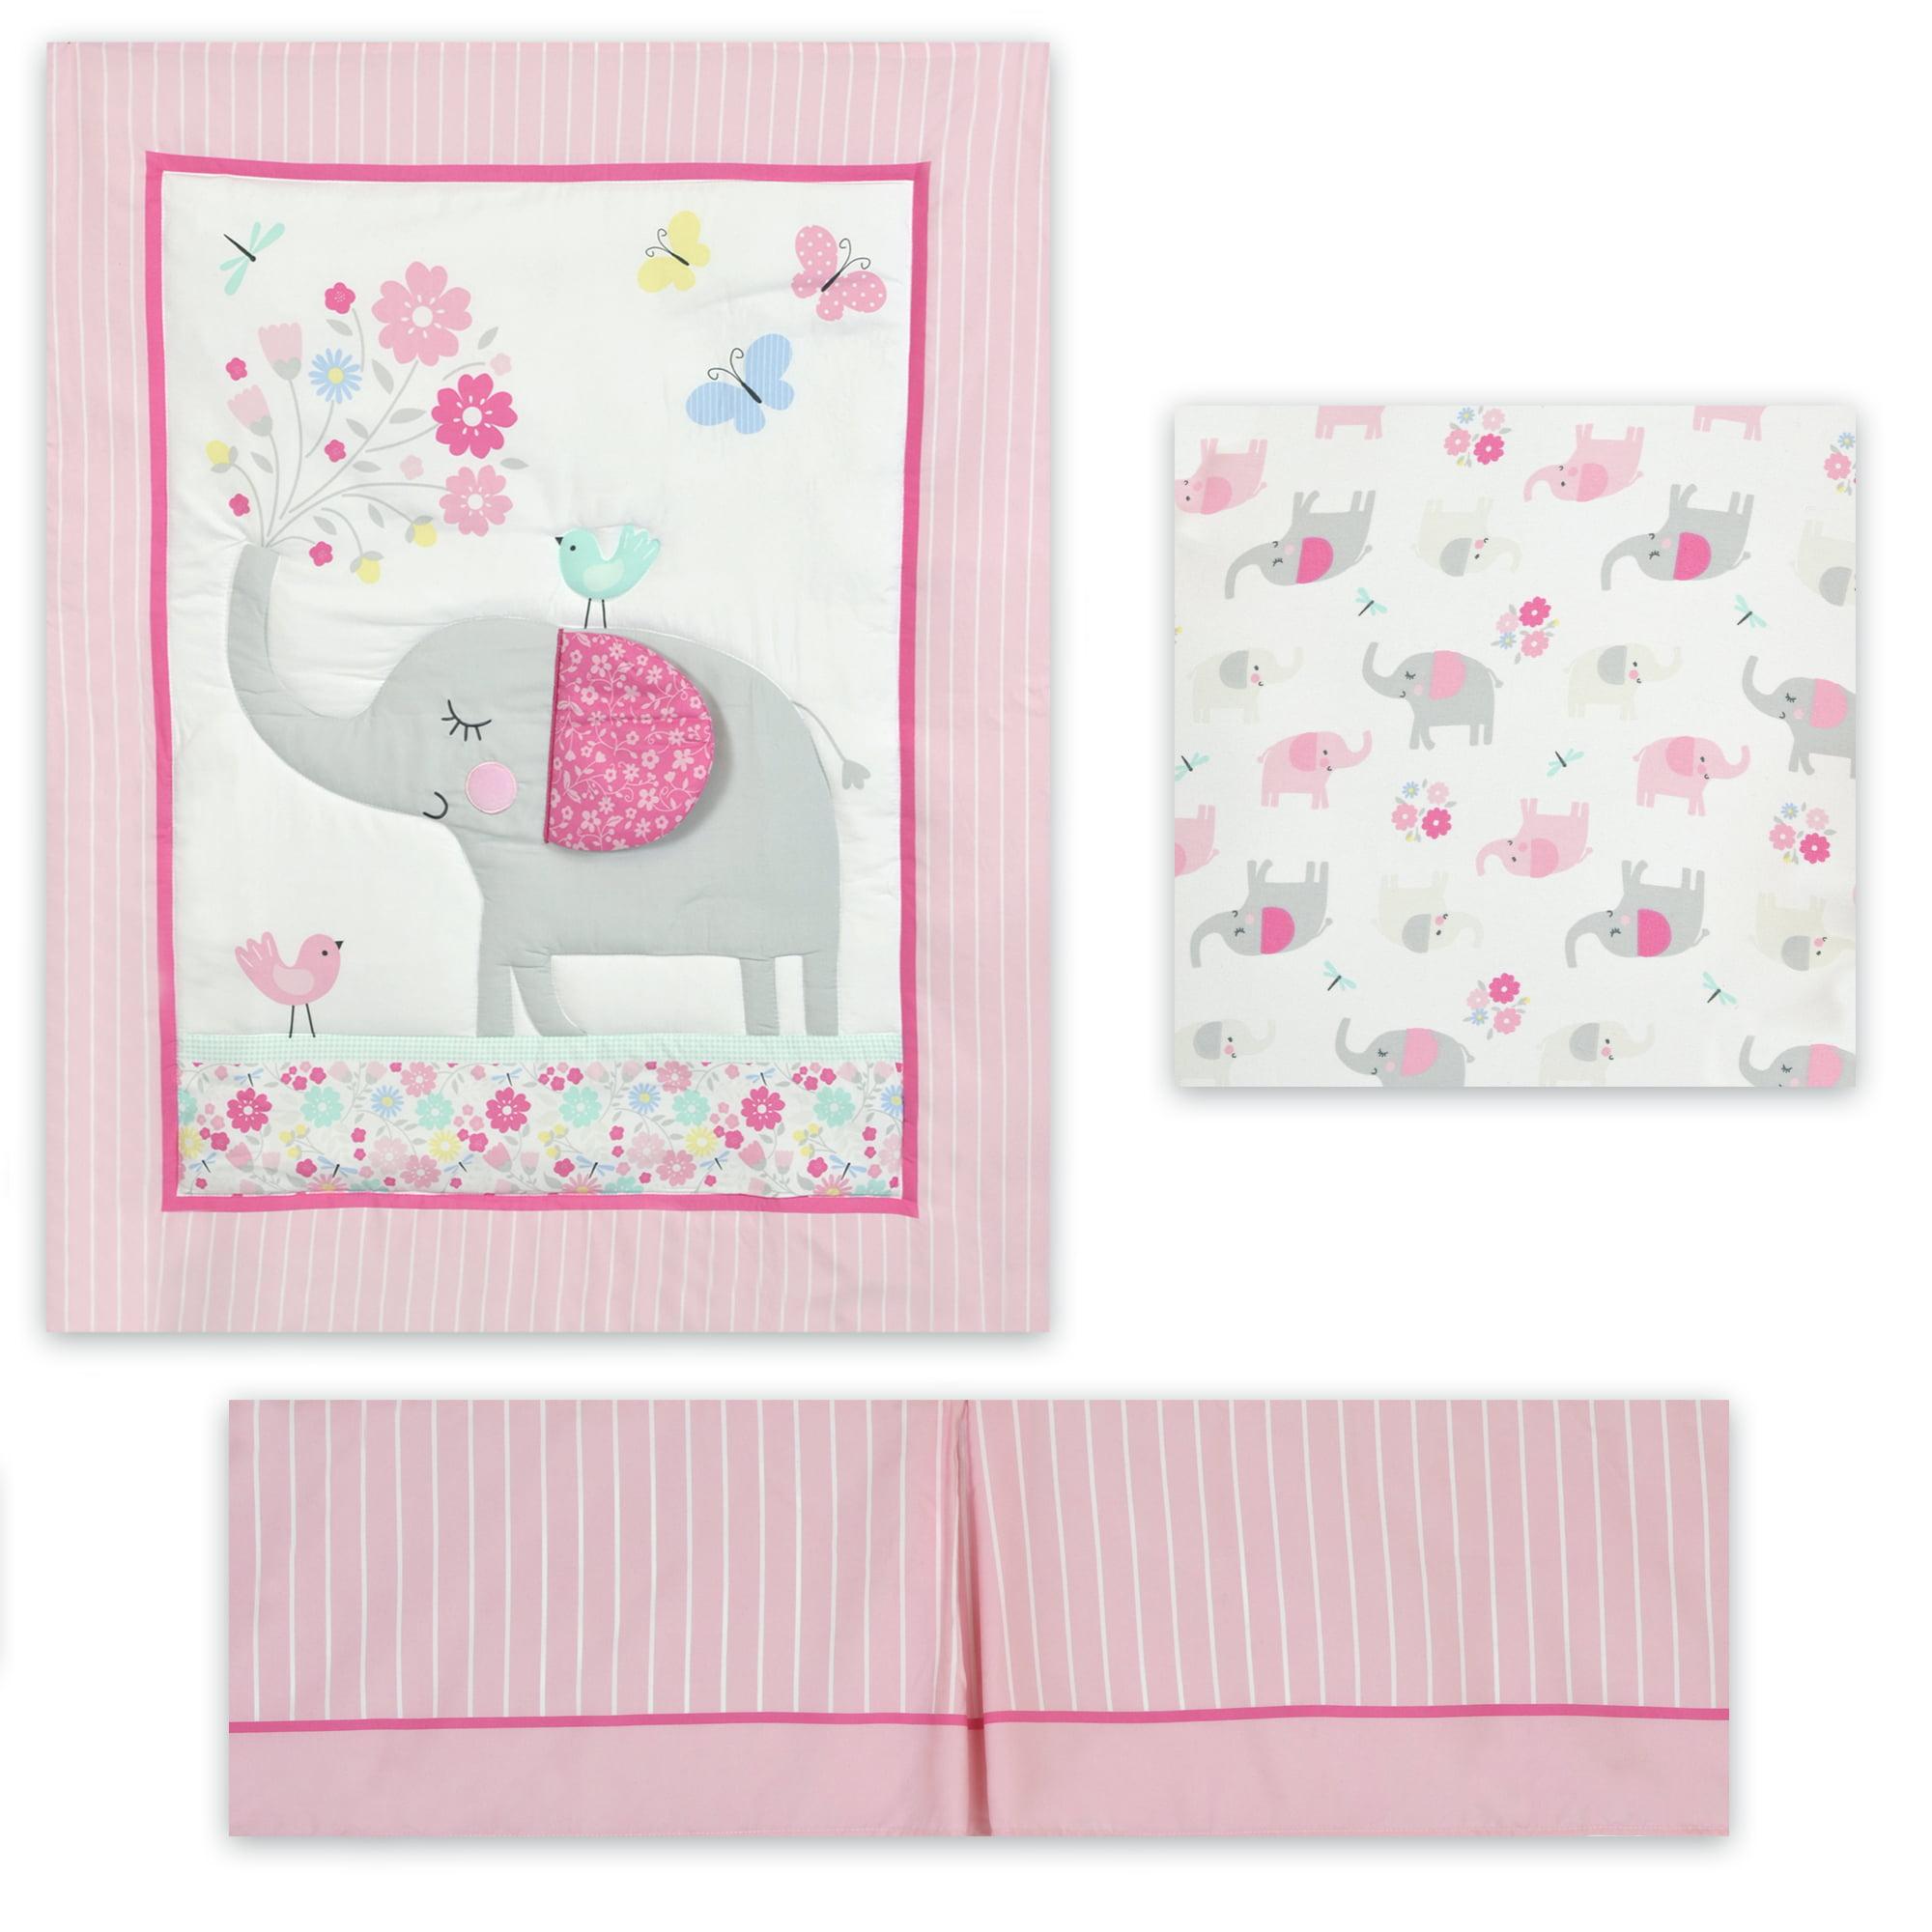 Parent's Choice Nursery Set, 3 Piece Set, Elephant